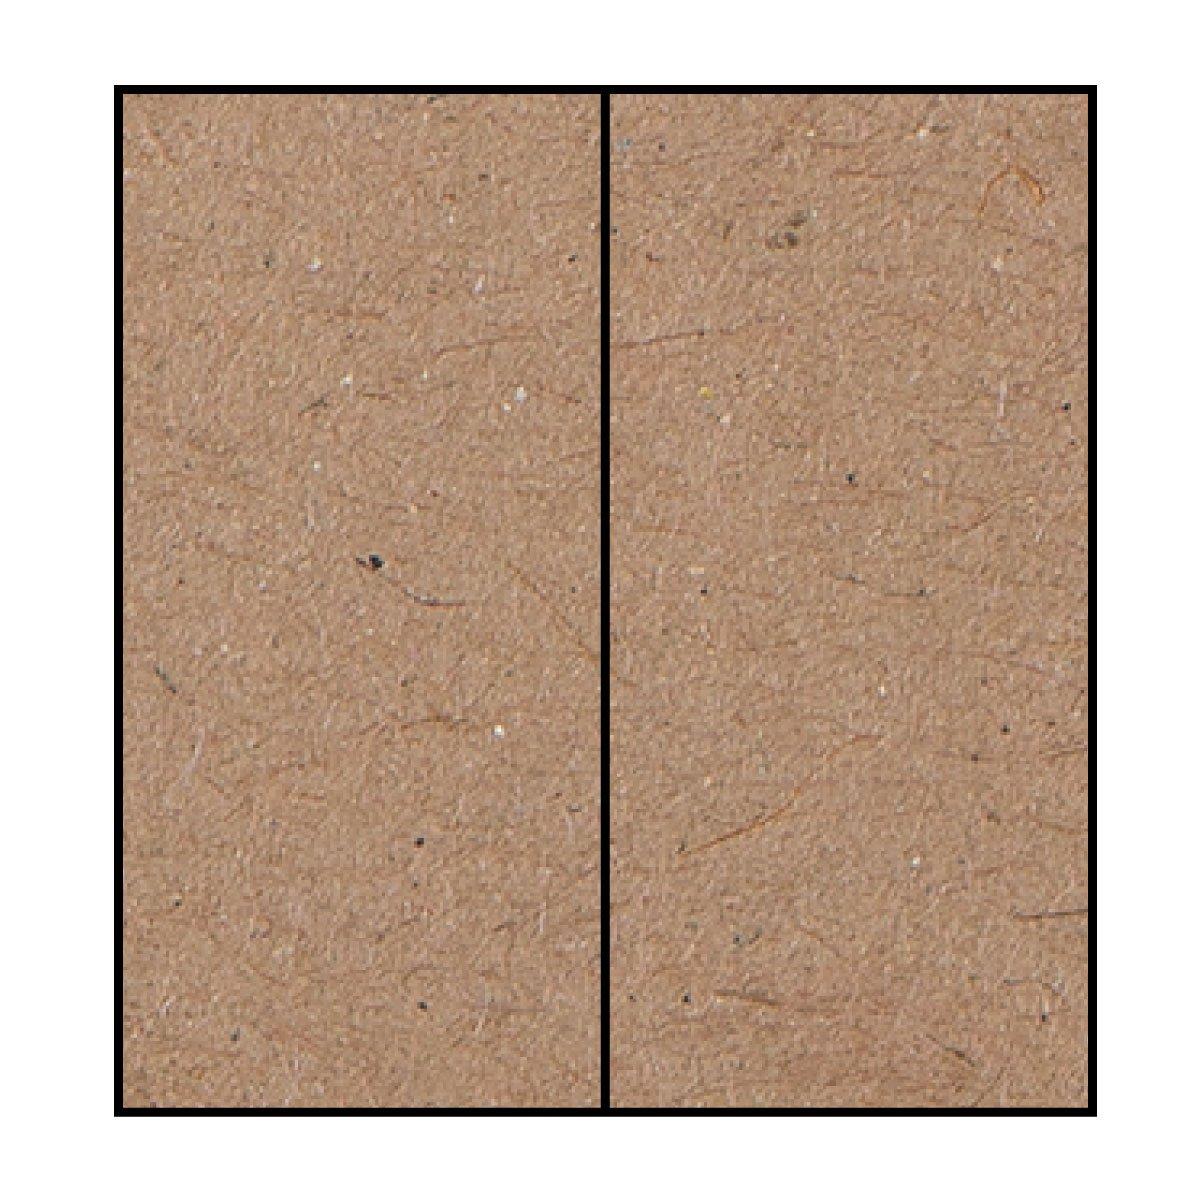 Rössler Papier - - Paperado-Karte DL hd-pl, Kraft B07CX7W6PK | Großhandel